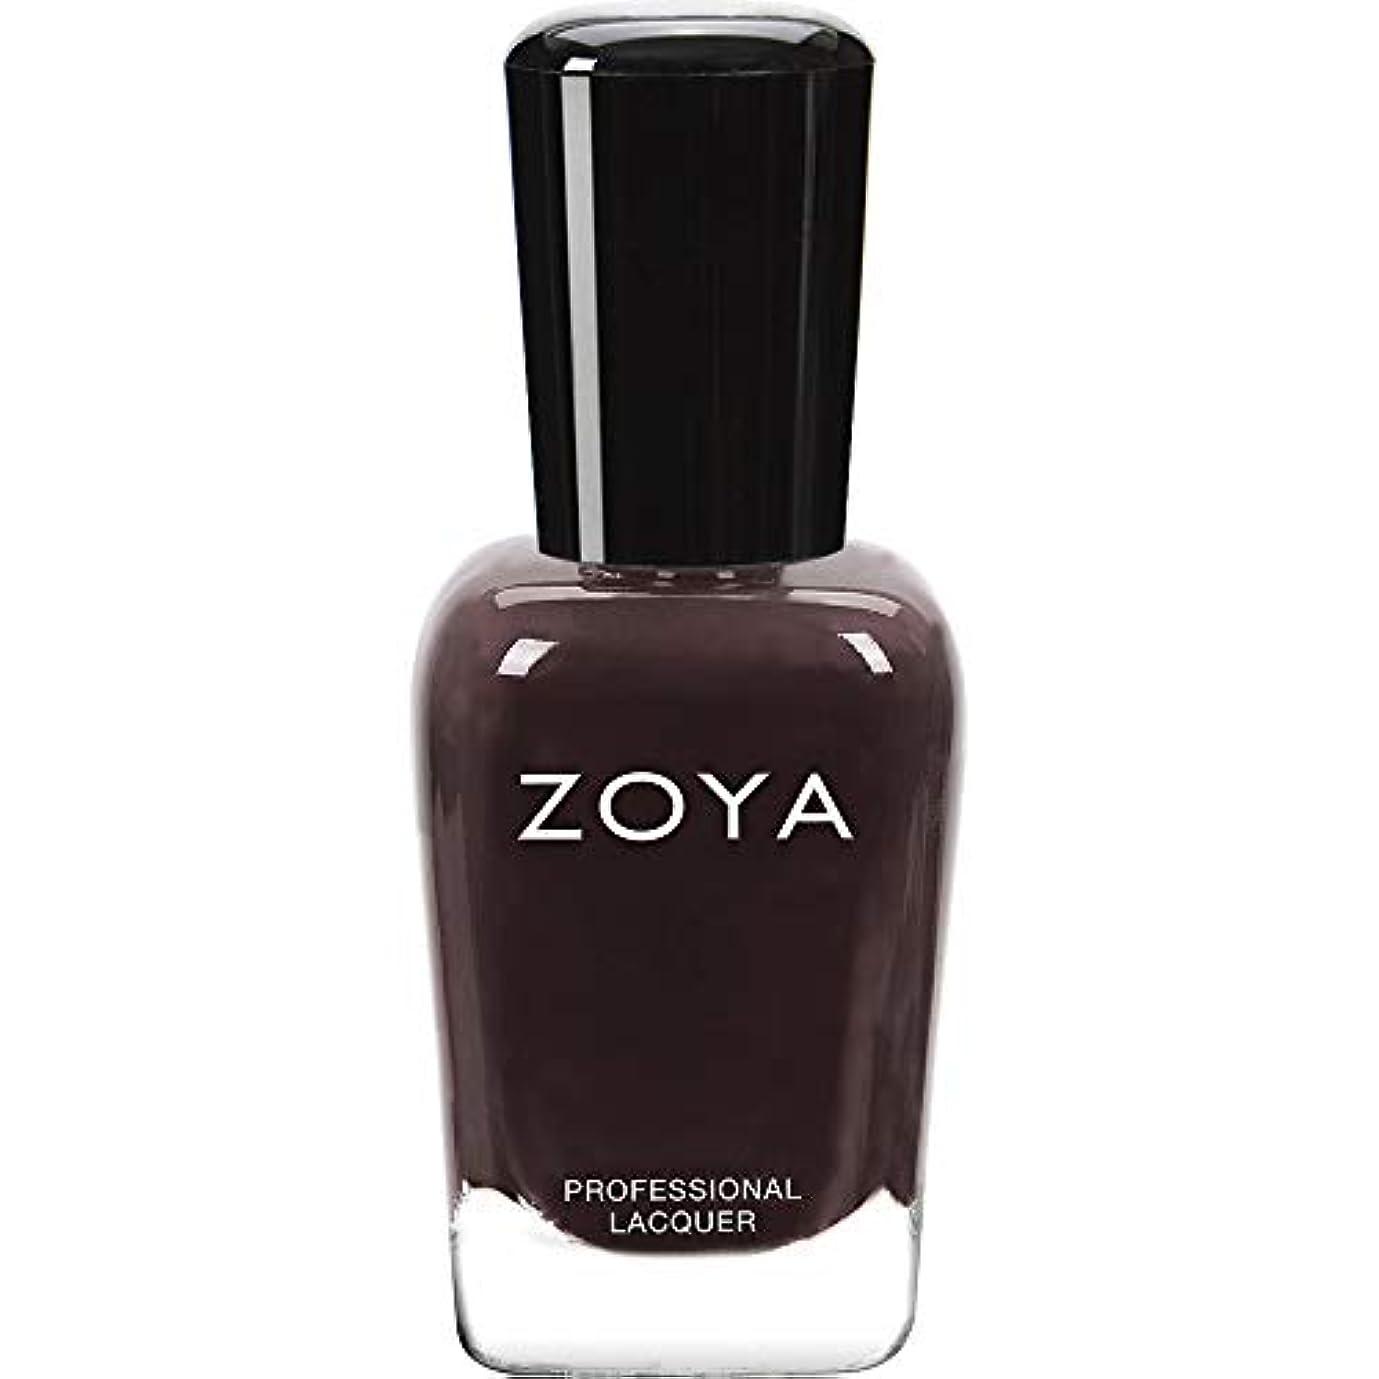 ZOYA ゾーヤ ネイルカラー ZP912 ELAINE エレイン 15ml マット 爪にやさしいネイルラッカーマニキュア